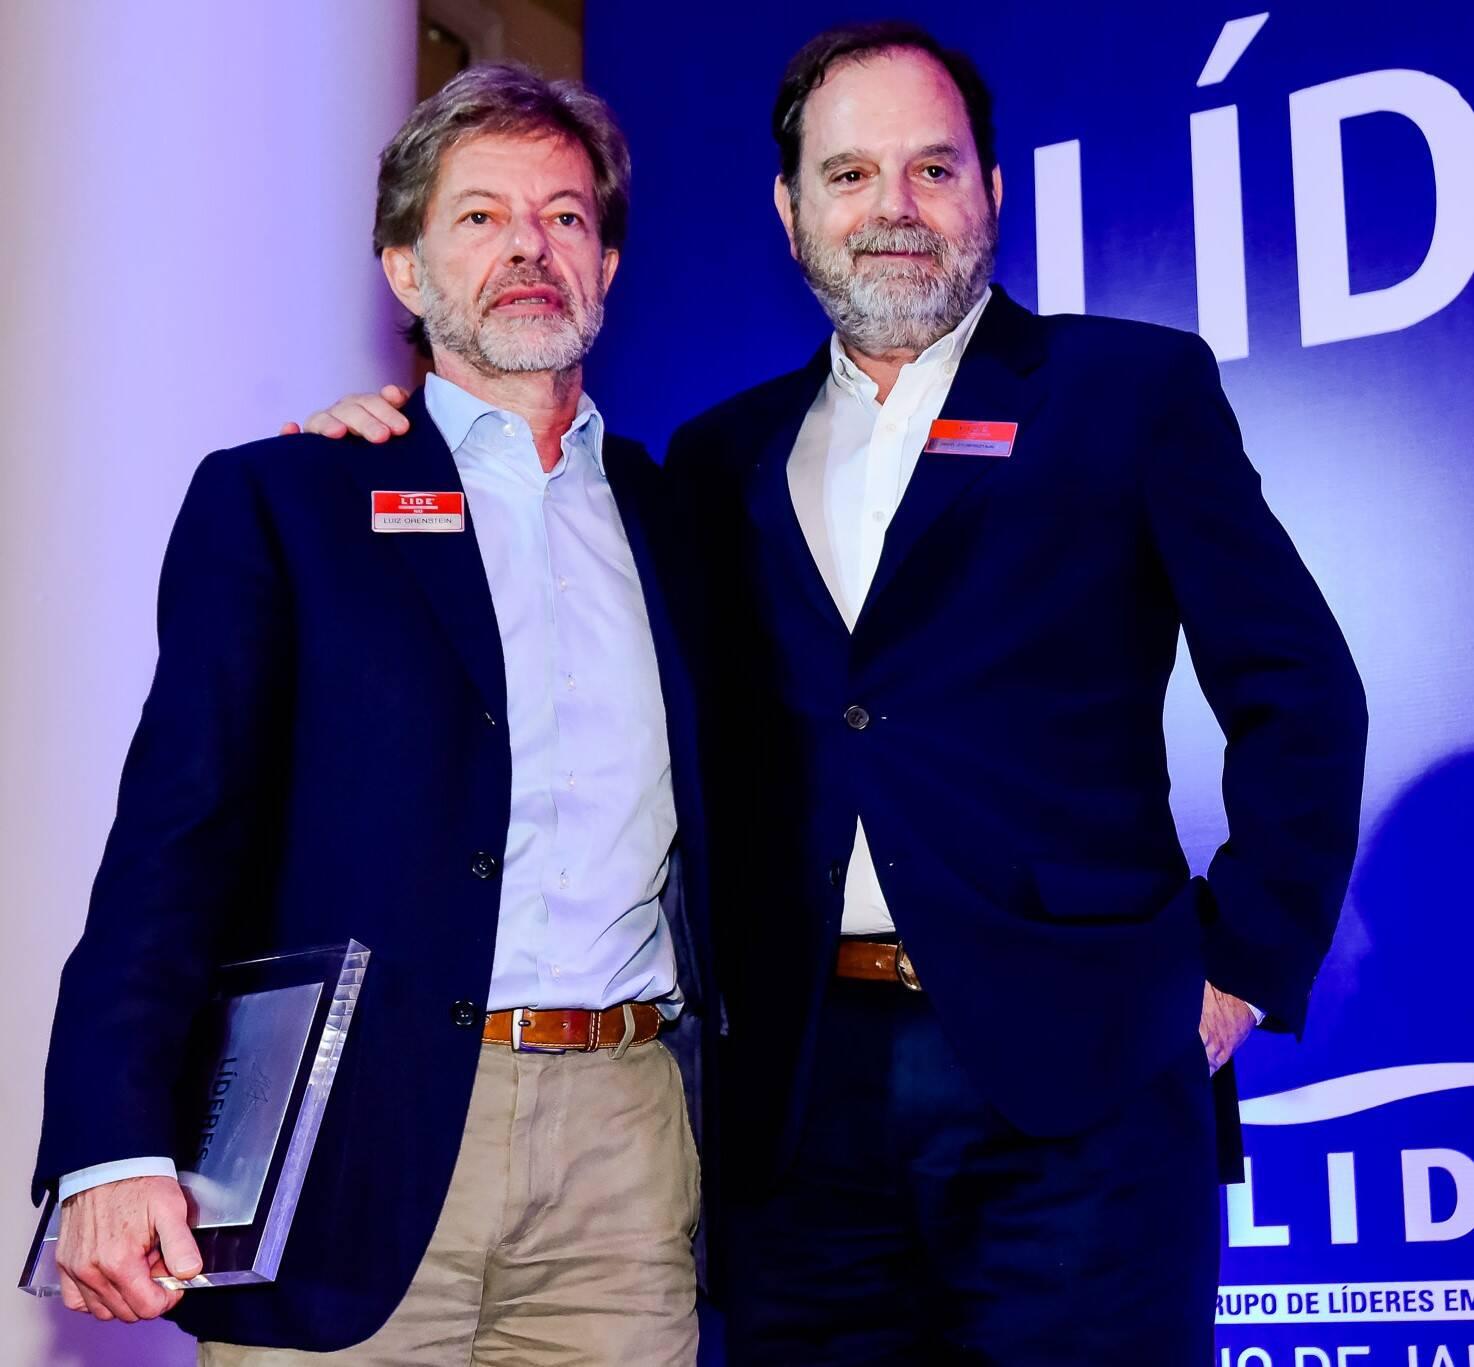 Luiz Orenstein e David Zylbersztajn /Foto: Renato Wrobel